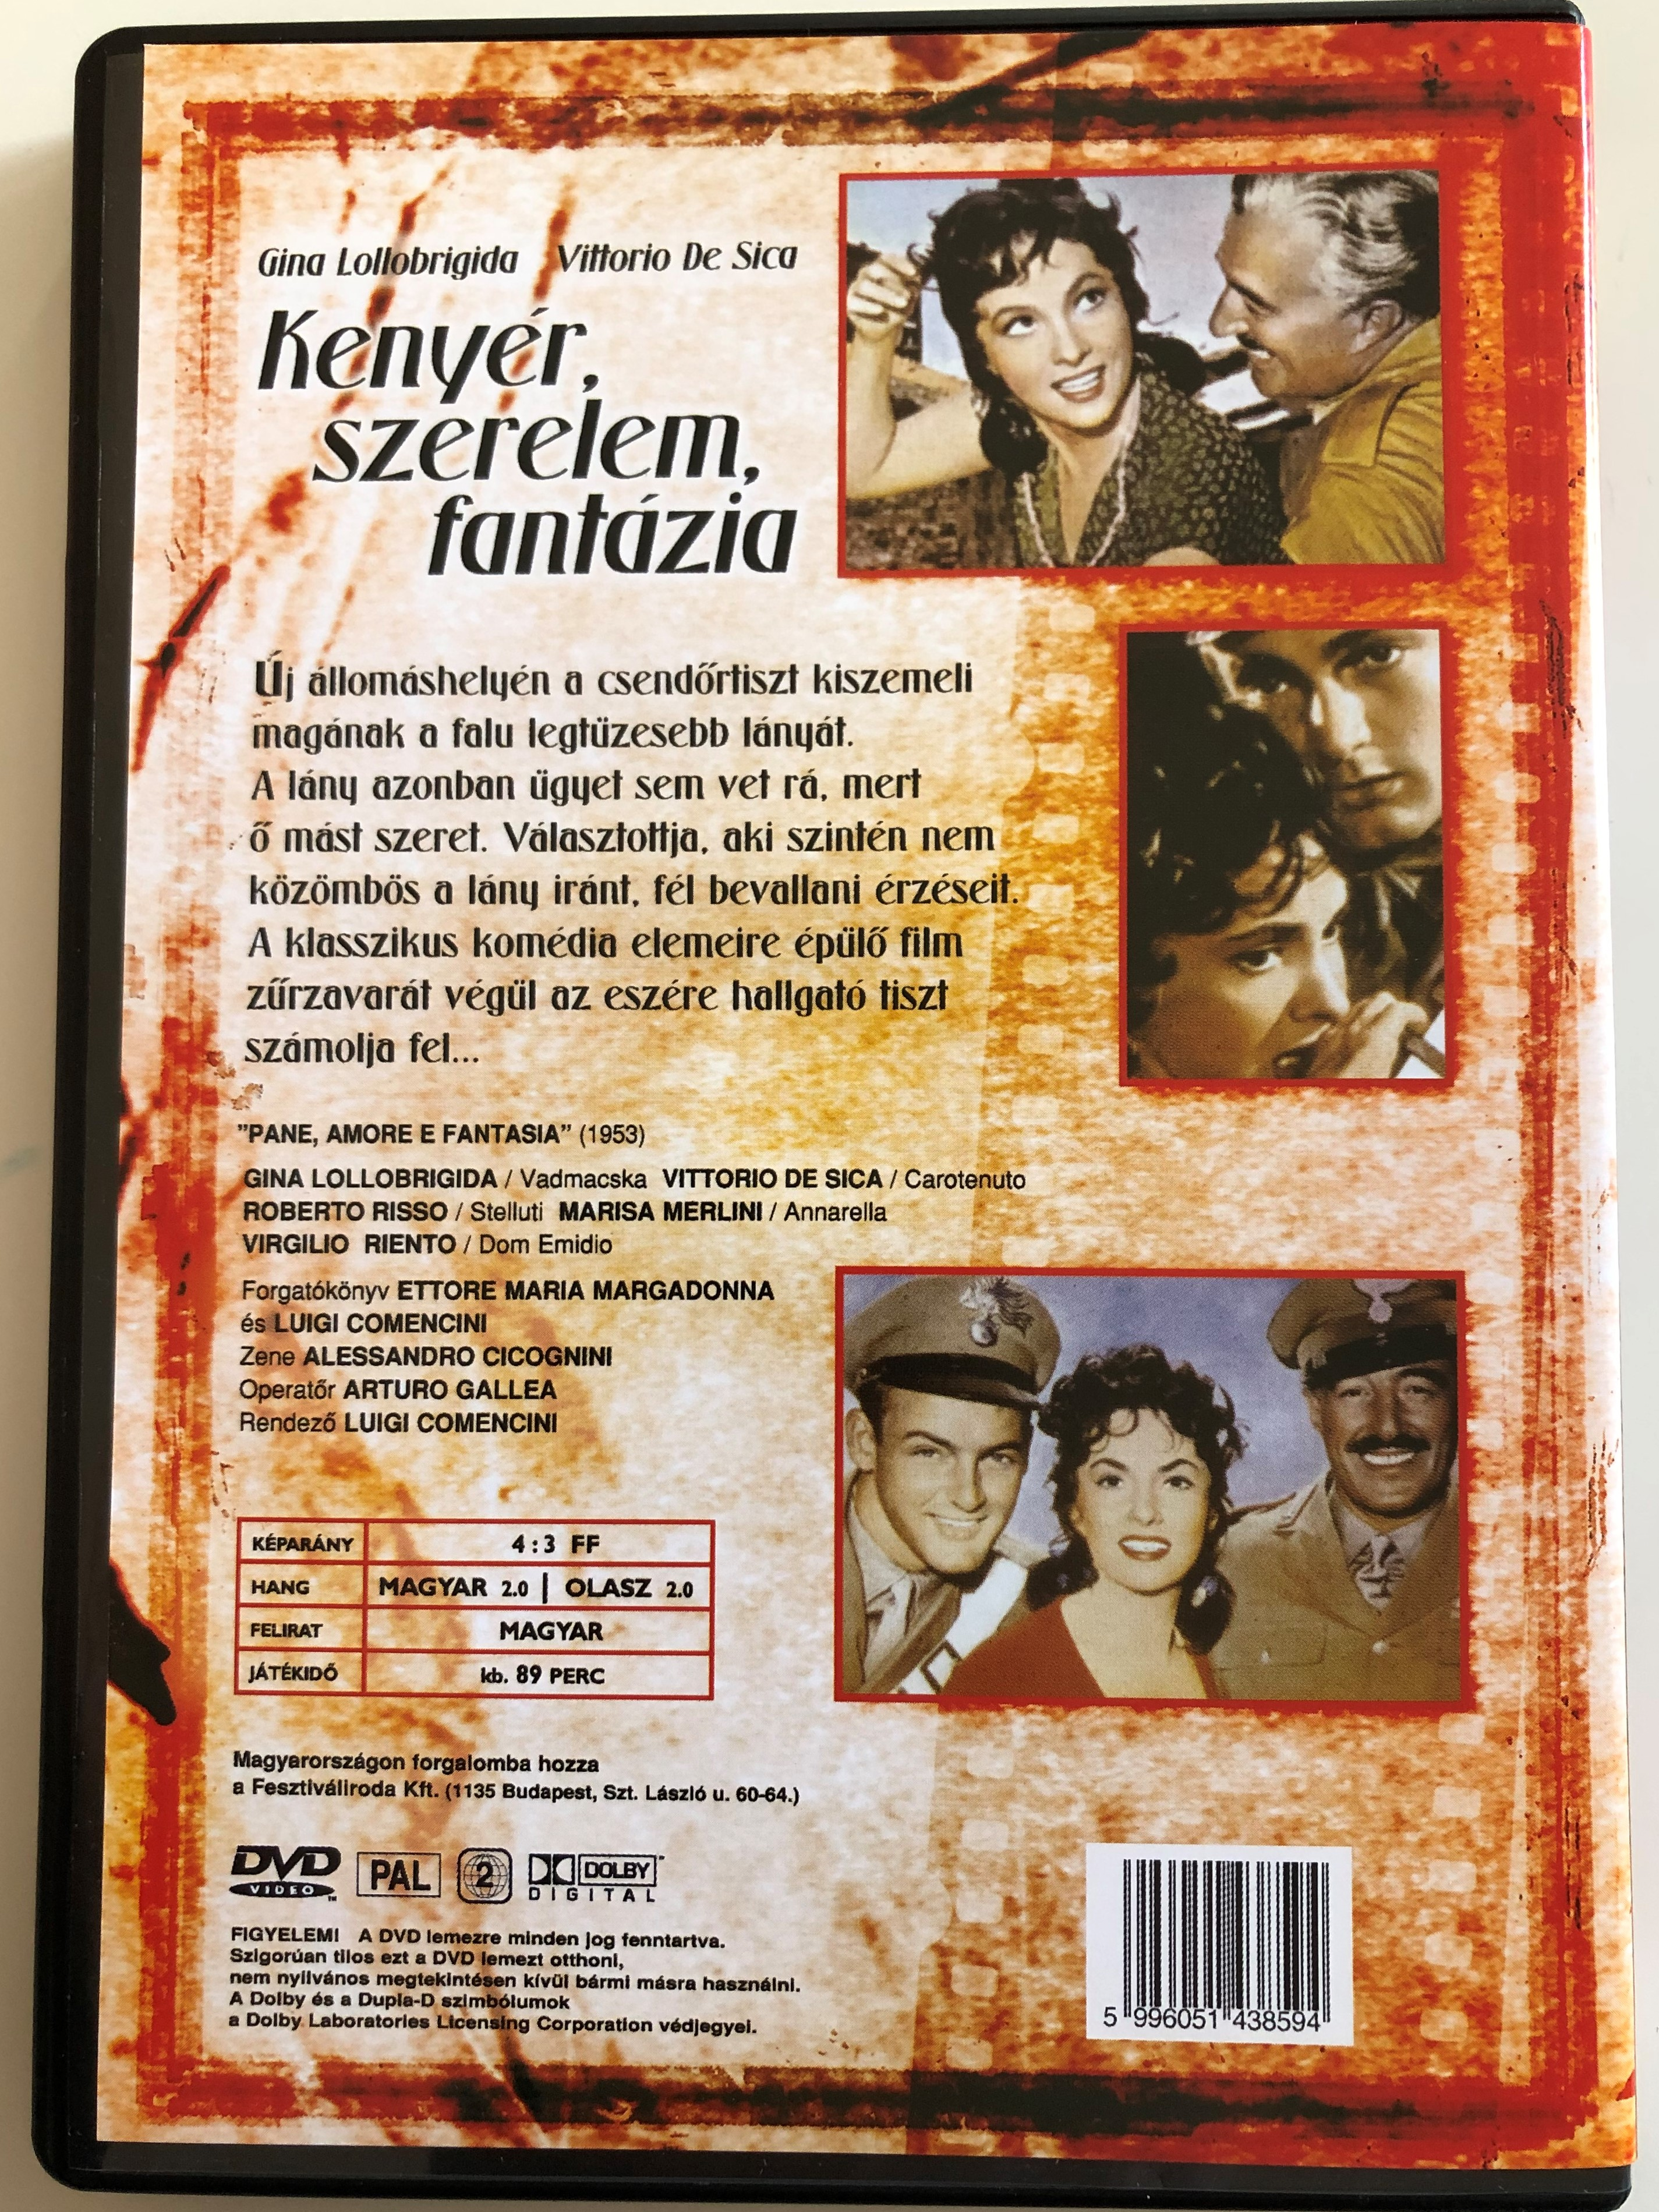 -pane-amore-e-fantasia-dvd-1953-keny-r-szerelem-fant-zia-2.jpg